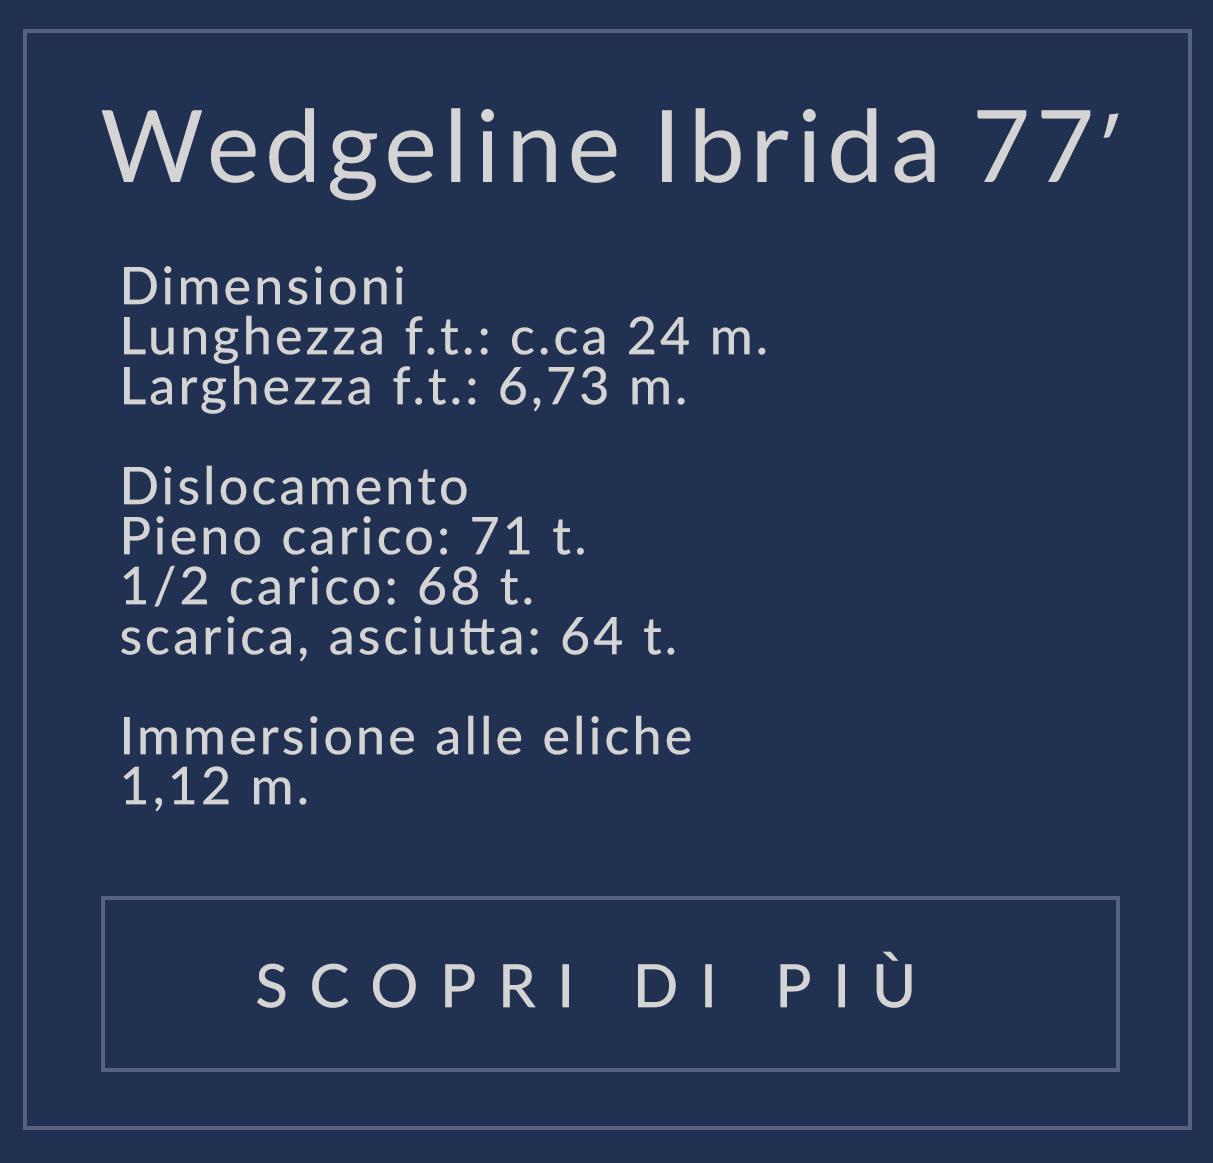 77ibri